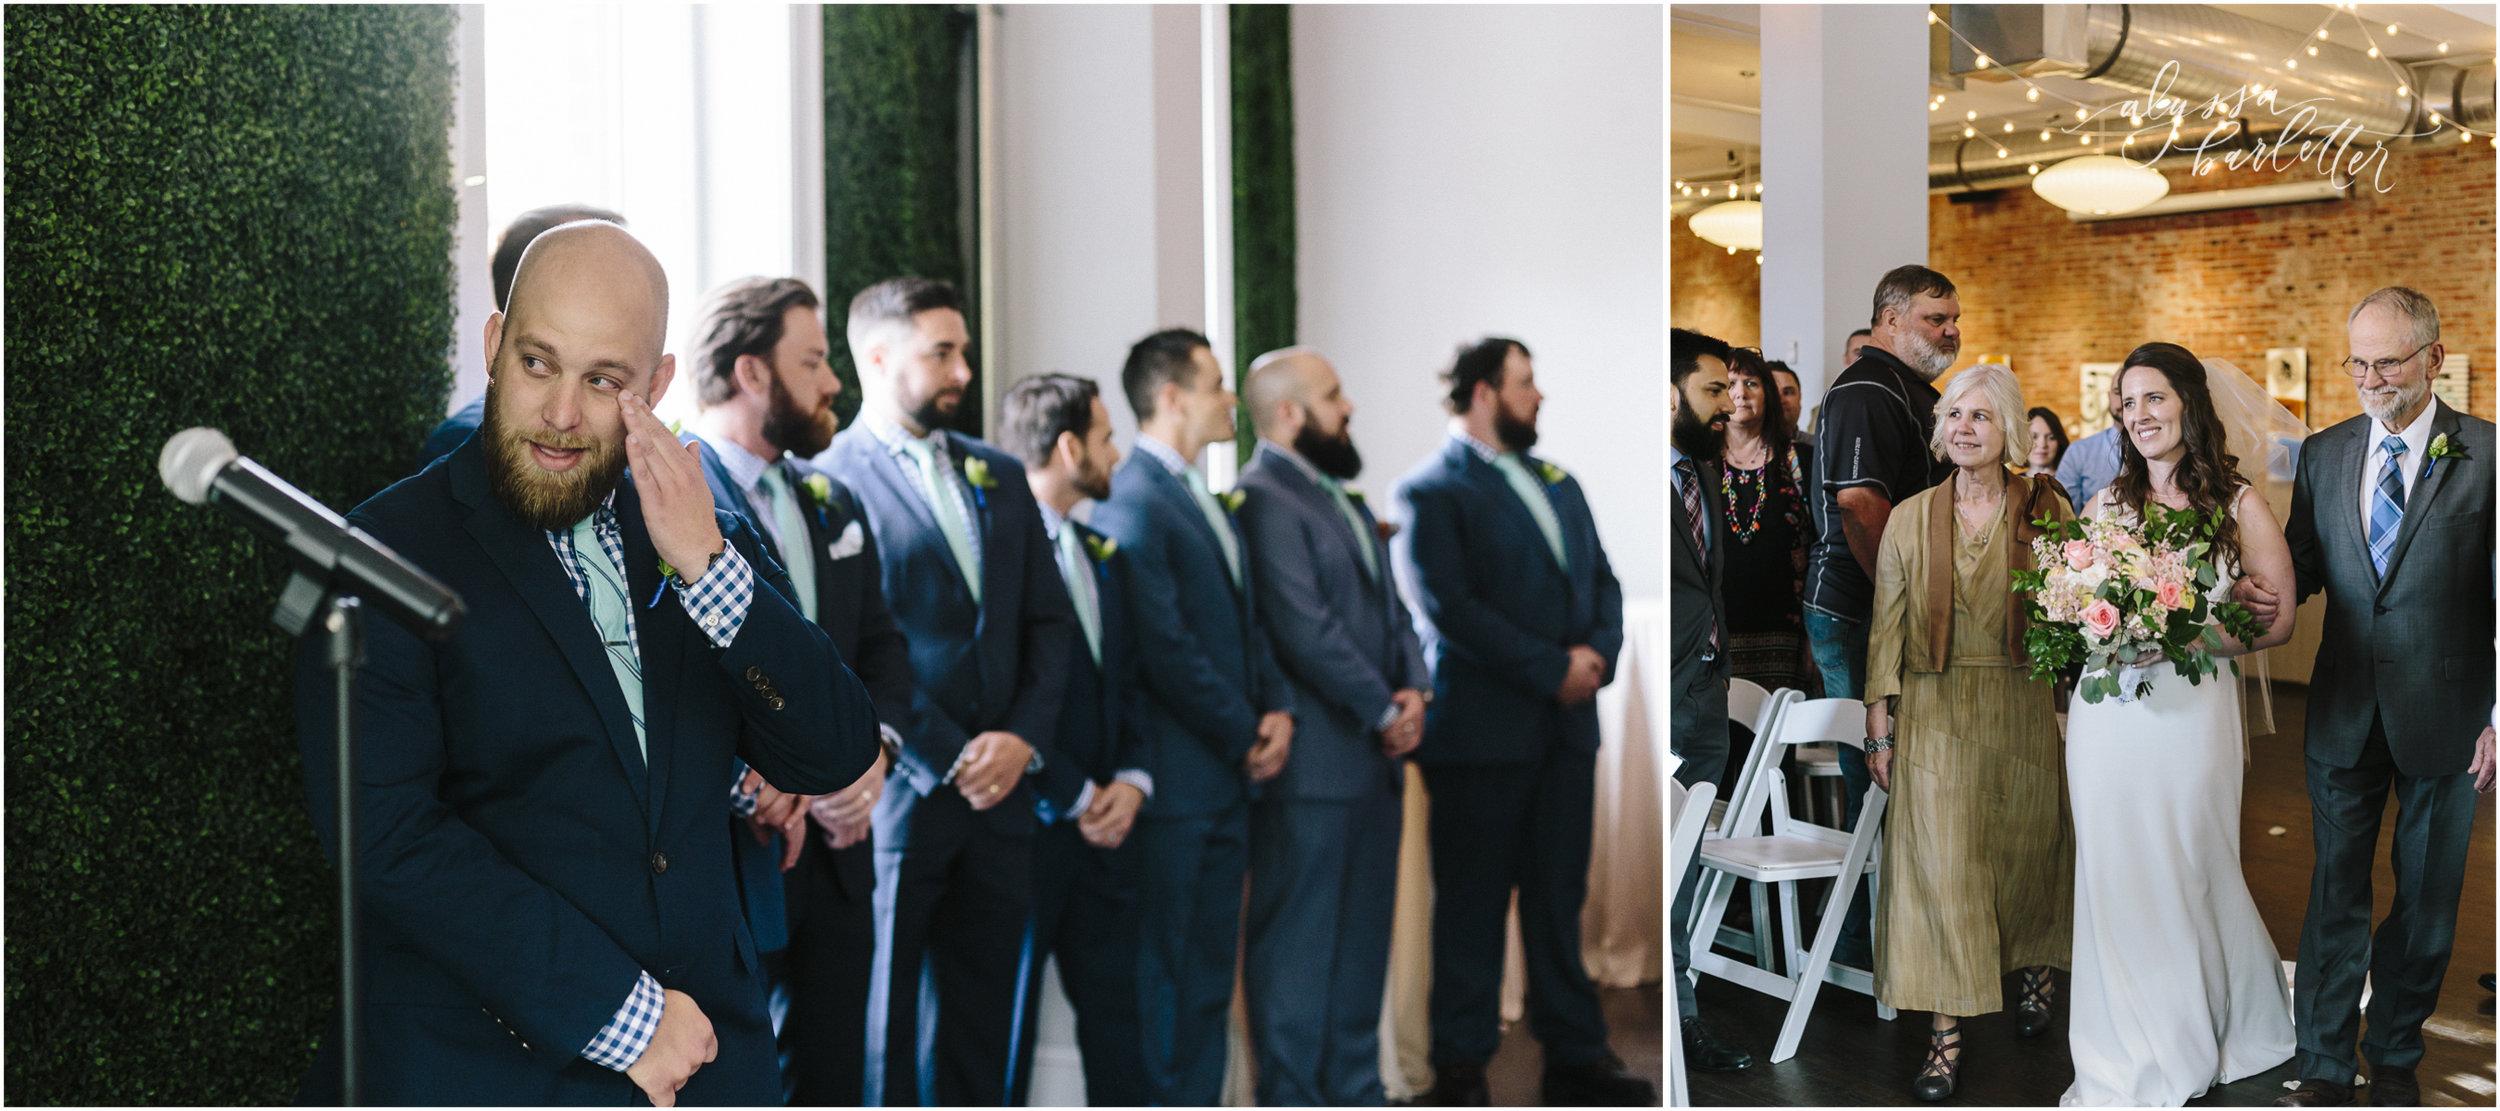 alyssa barletter photography kansas city wedding 2016 main courtney and brian-1-17.jpg